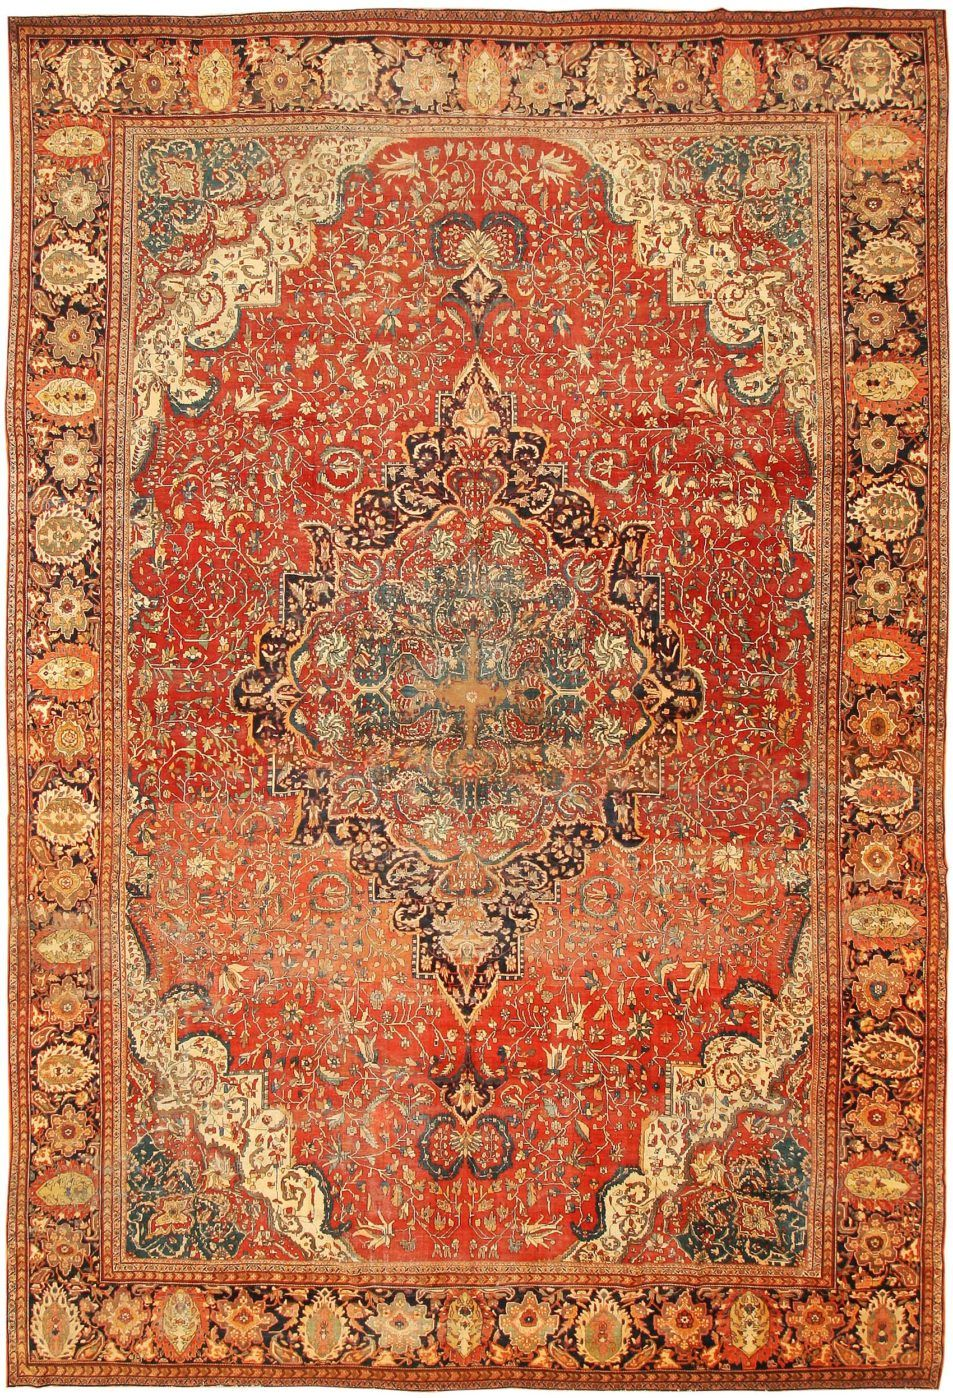 Antique Persian Tabriz Rug 46383 Antique Persian Rug Persian Carpet Persian Rug